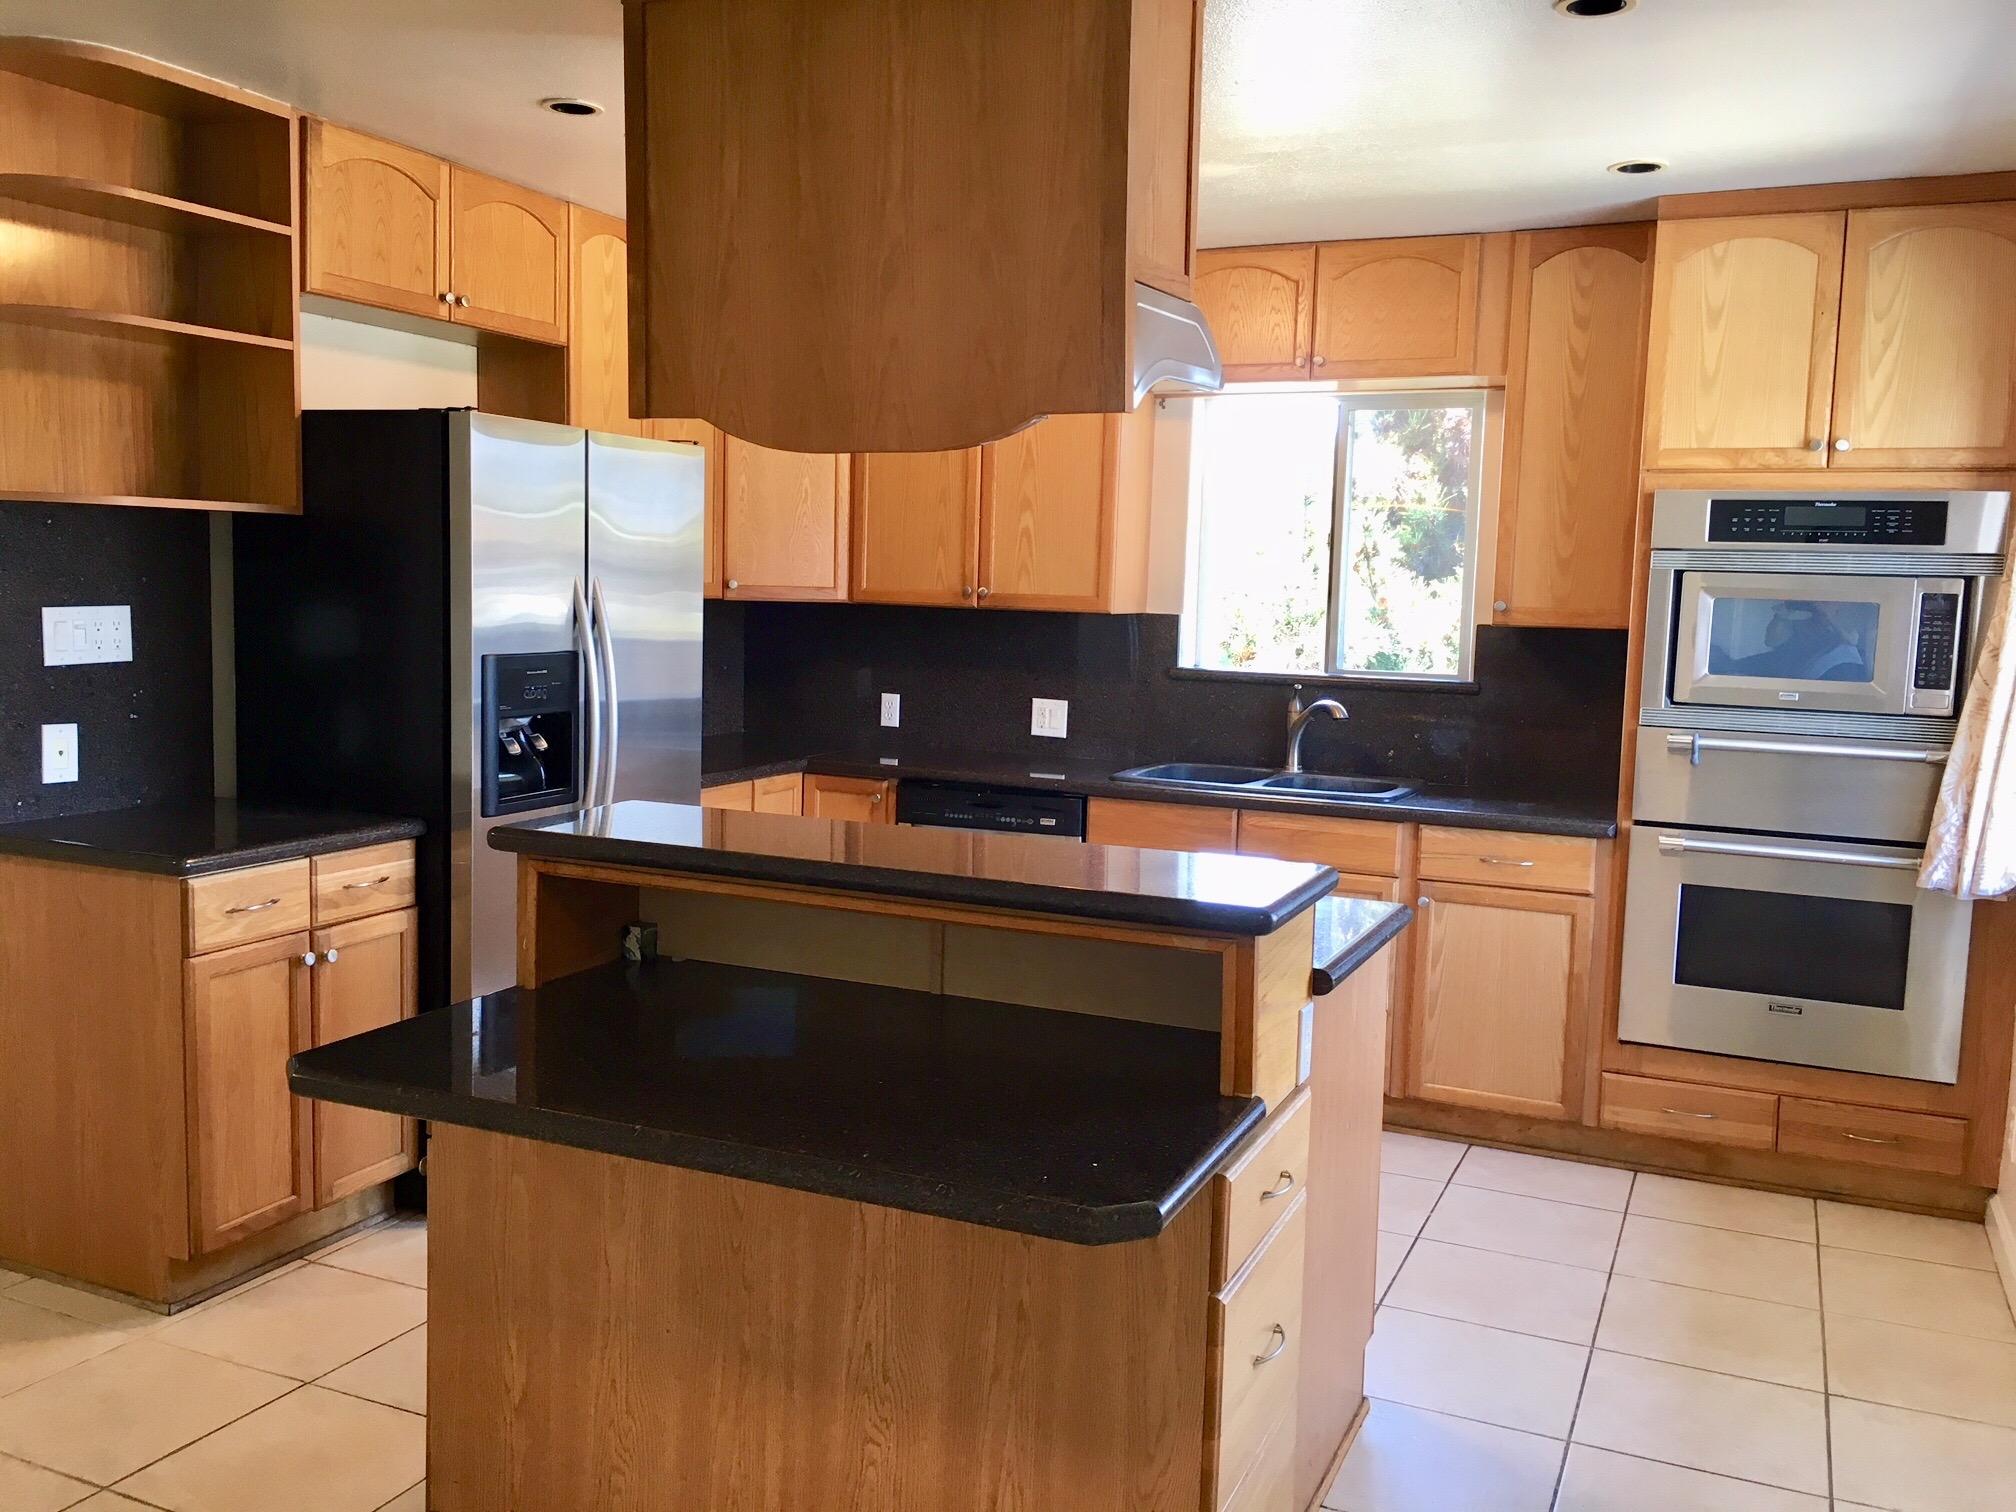 Francis Ct Torrance kitchen.jpg